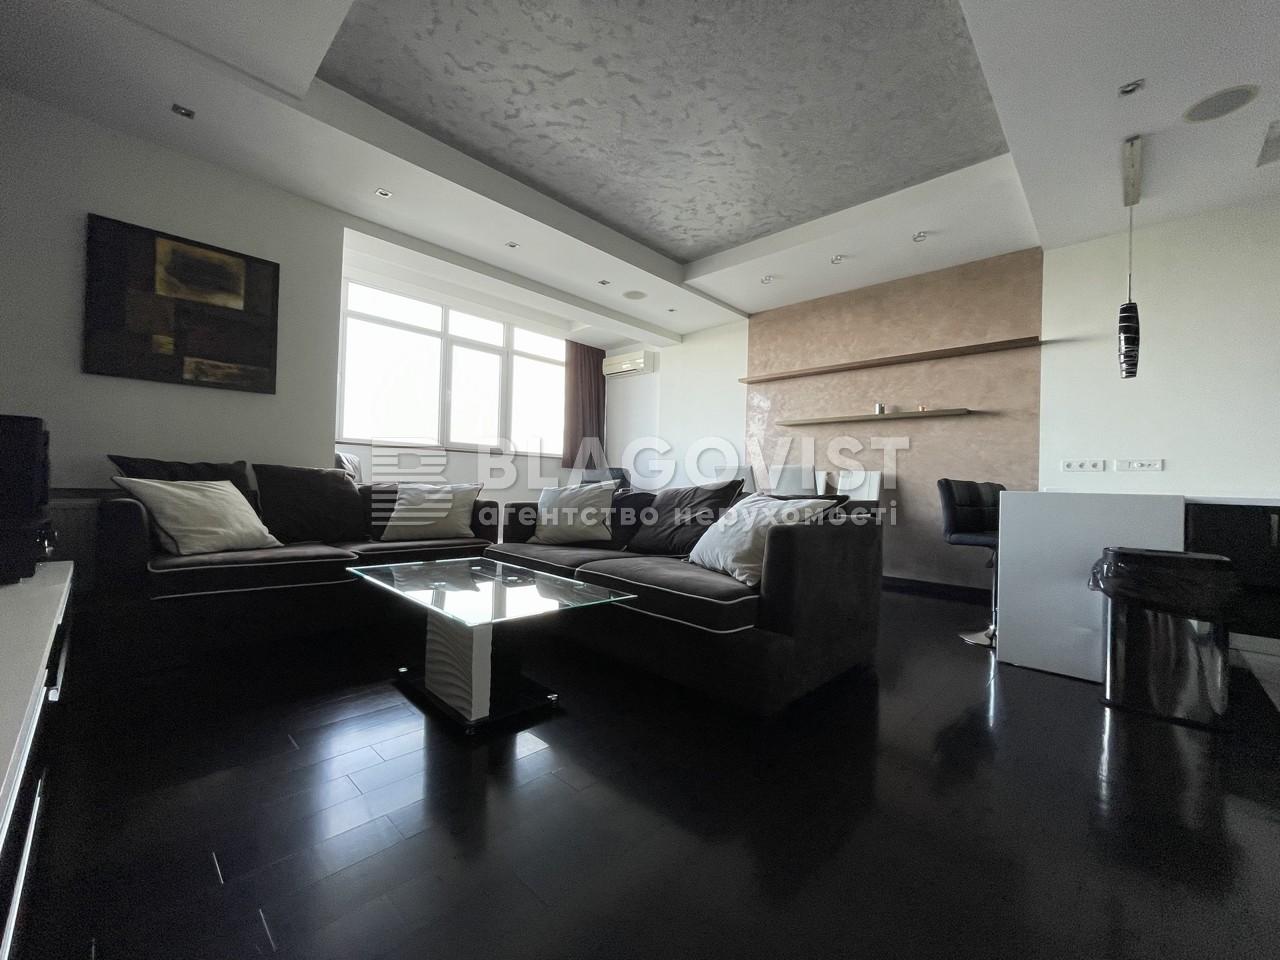 Квартира A-112442, Коновальца Евгения (Щорса), 44а, Киев - Фото 8